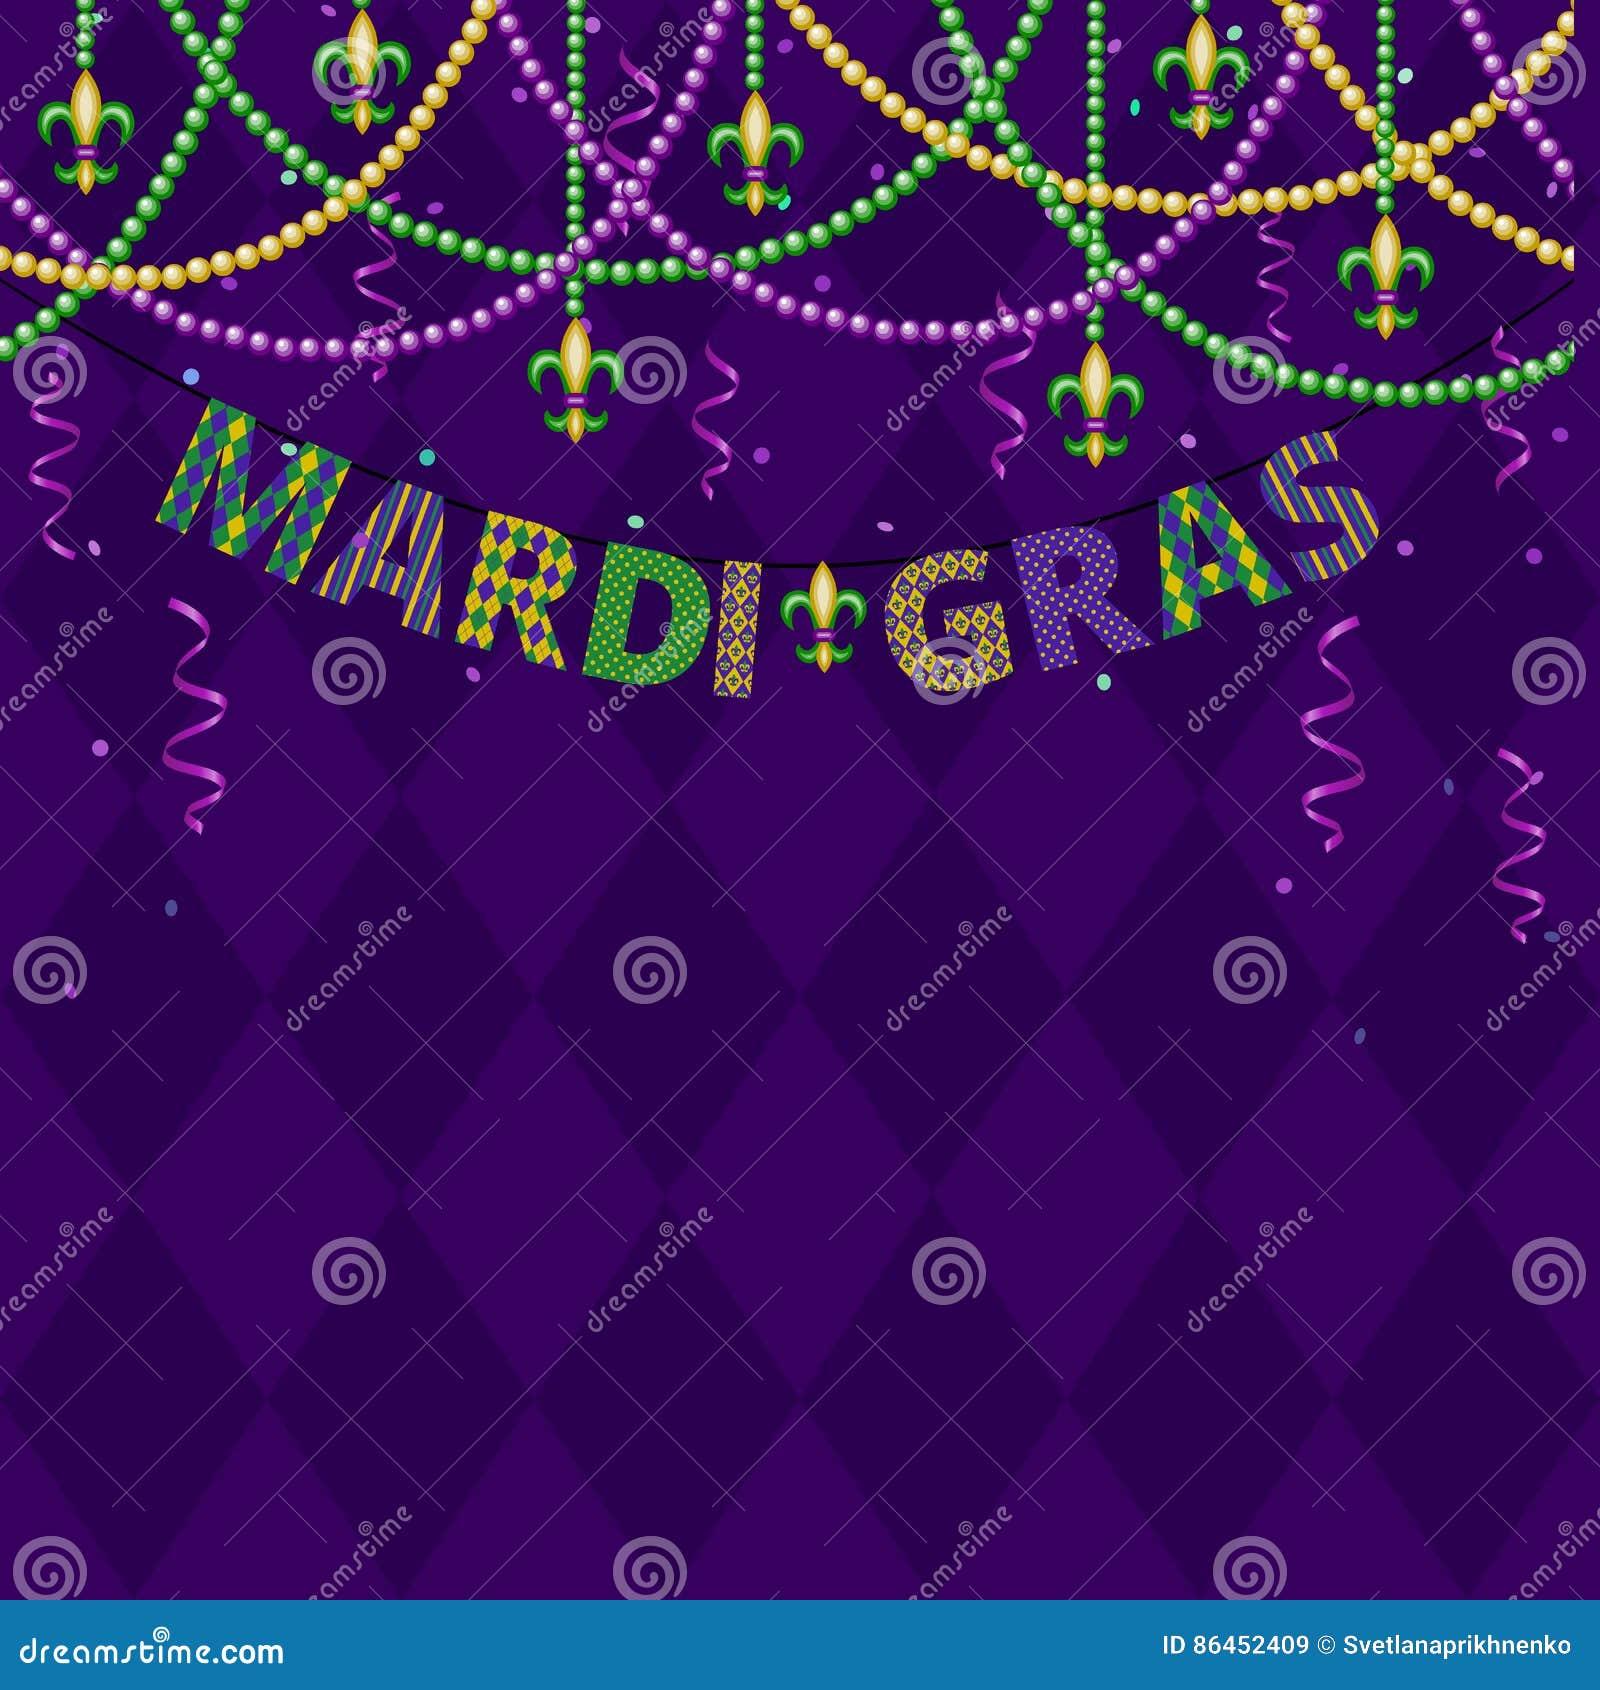 Mardi gras greetings